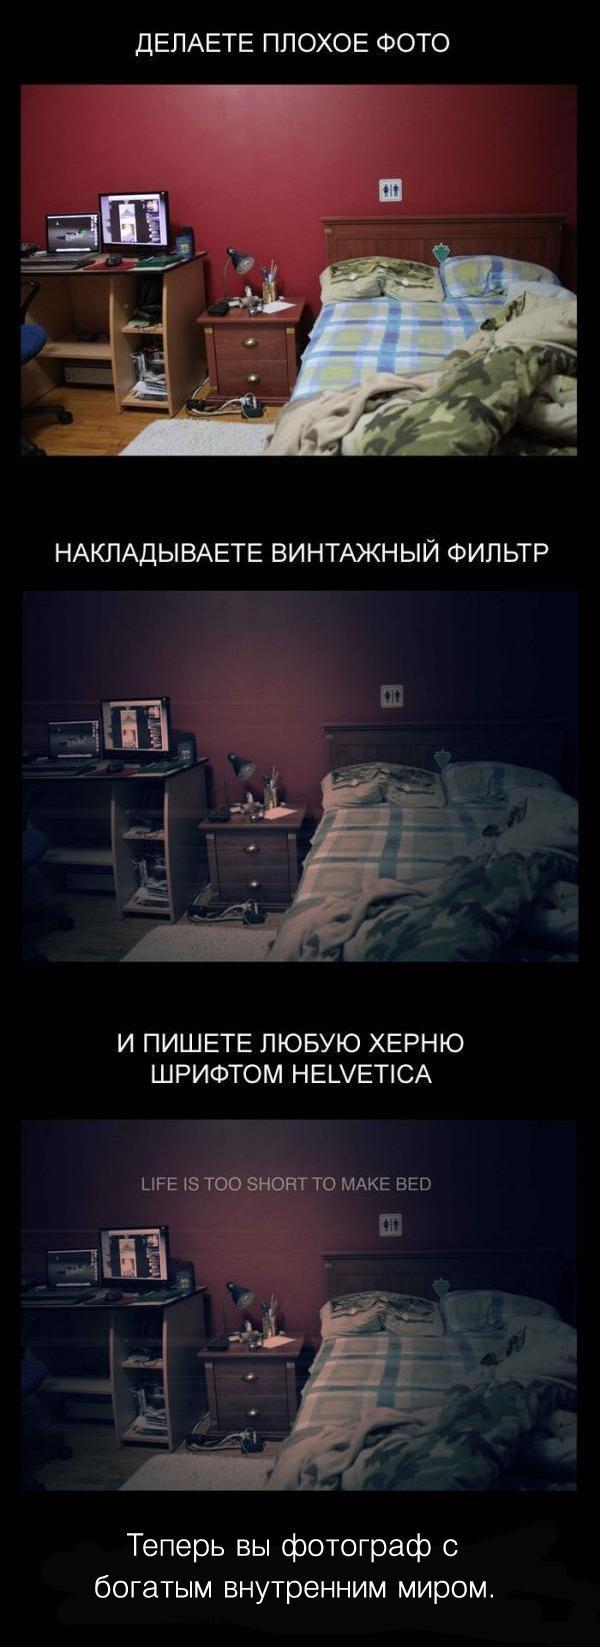 http://img-fotki.yandex.ru/get/5603/138238612.38/0_6c8a1_e16684cf_orig.jpg